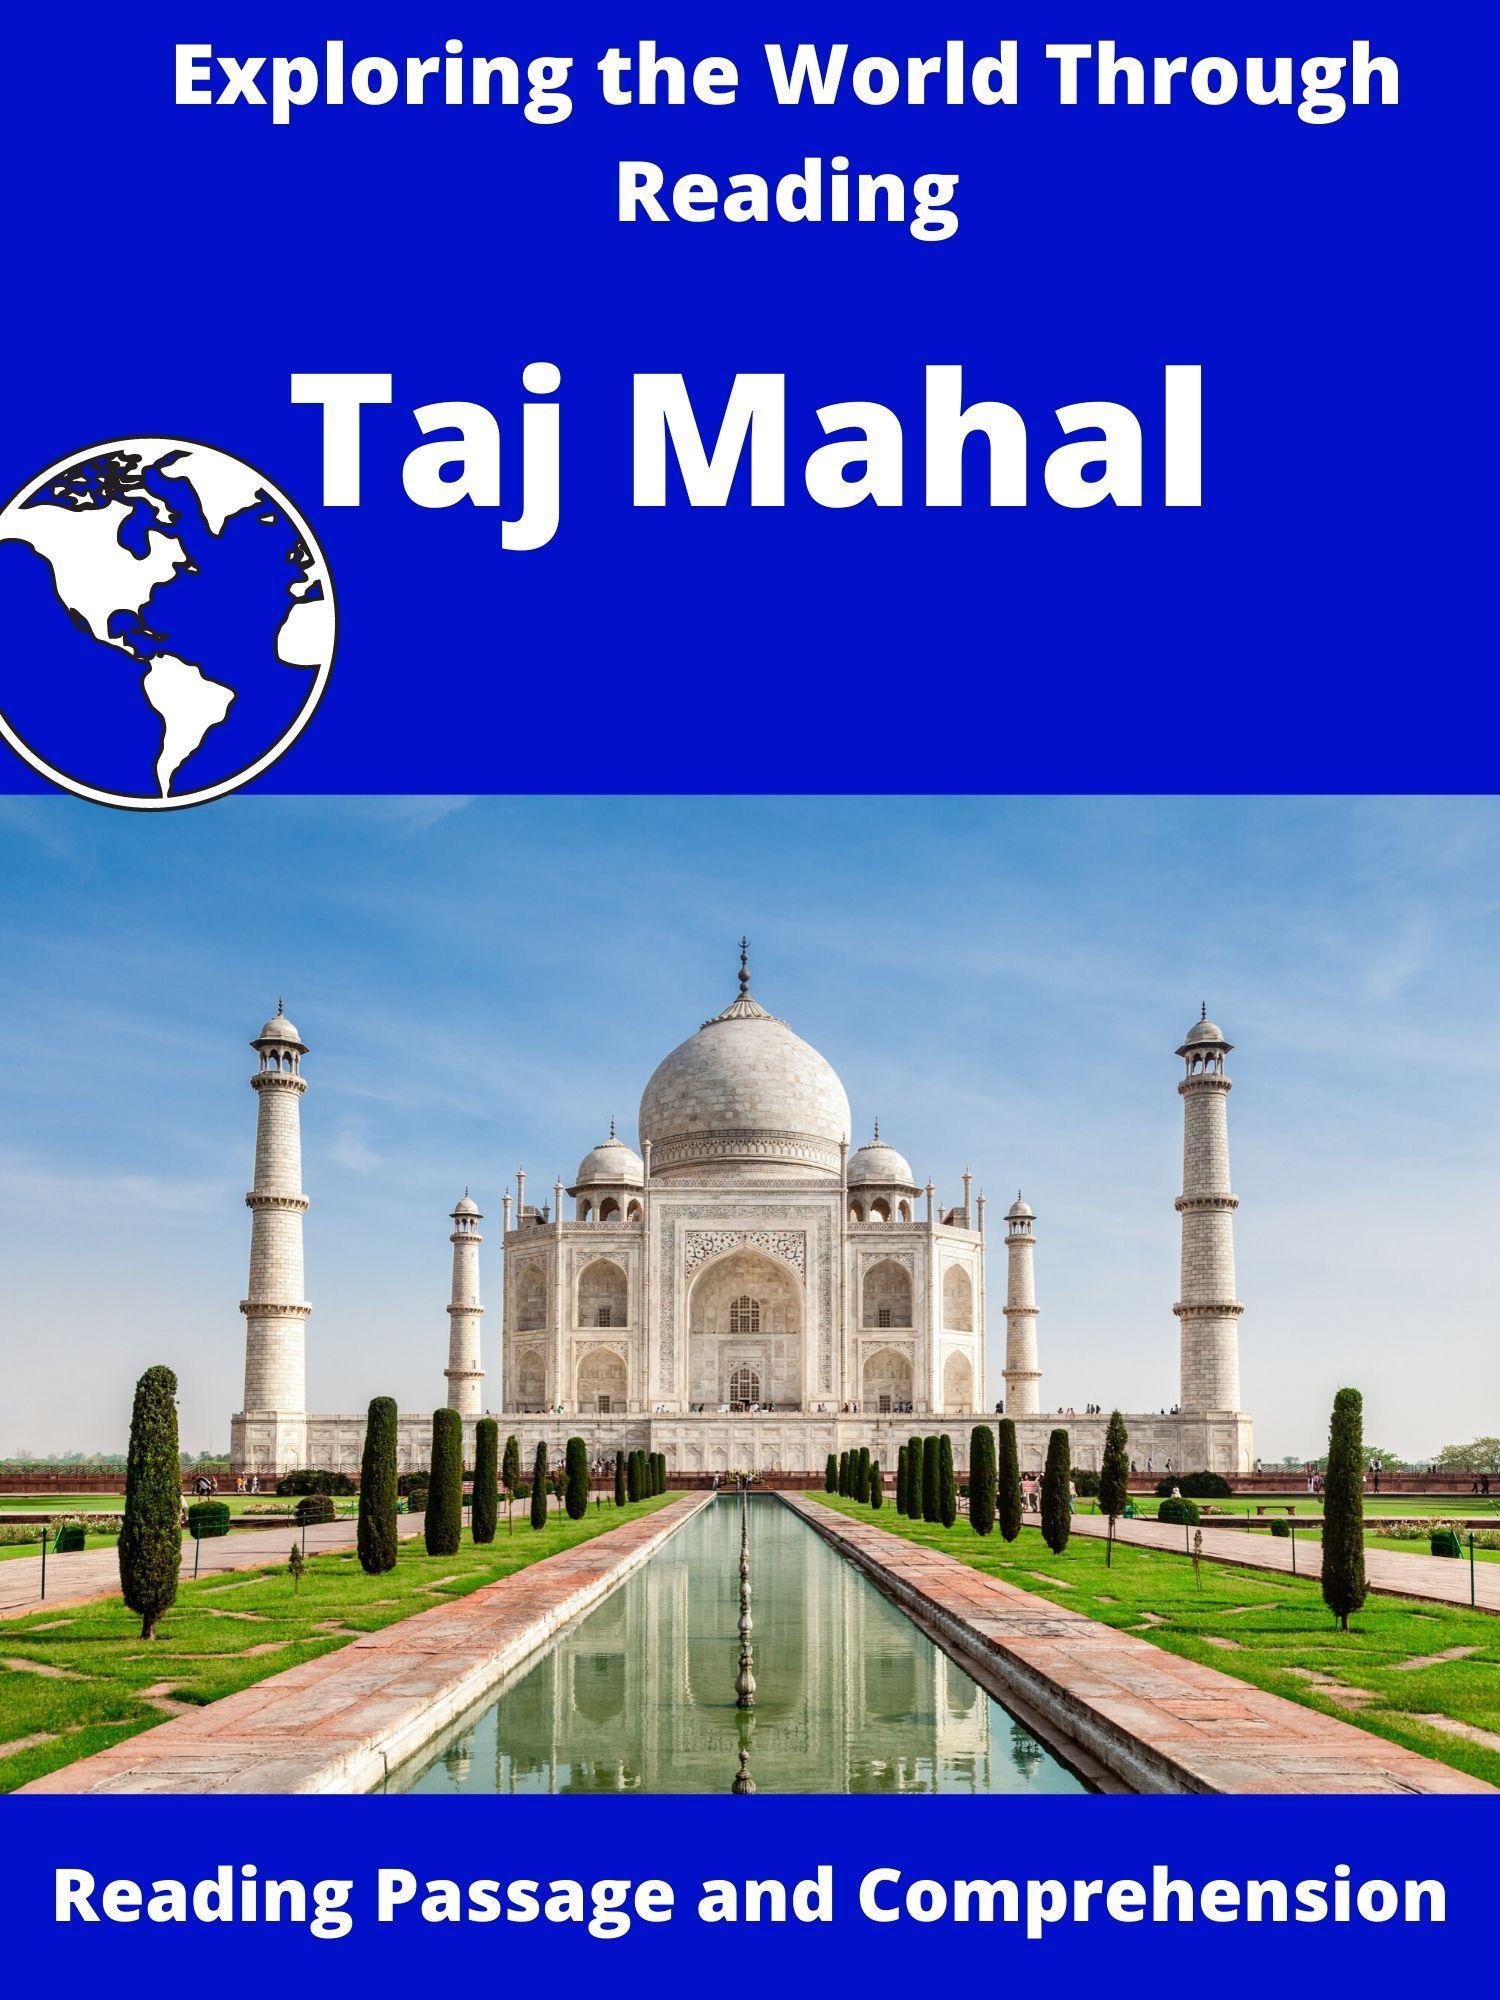 Taj Mahal Reading Passages Social Studies Middle School Upper Elementary Reading [ 2000 x 1500 Pixel ]